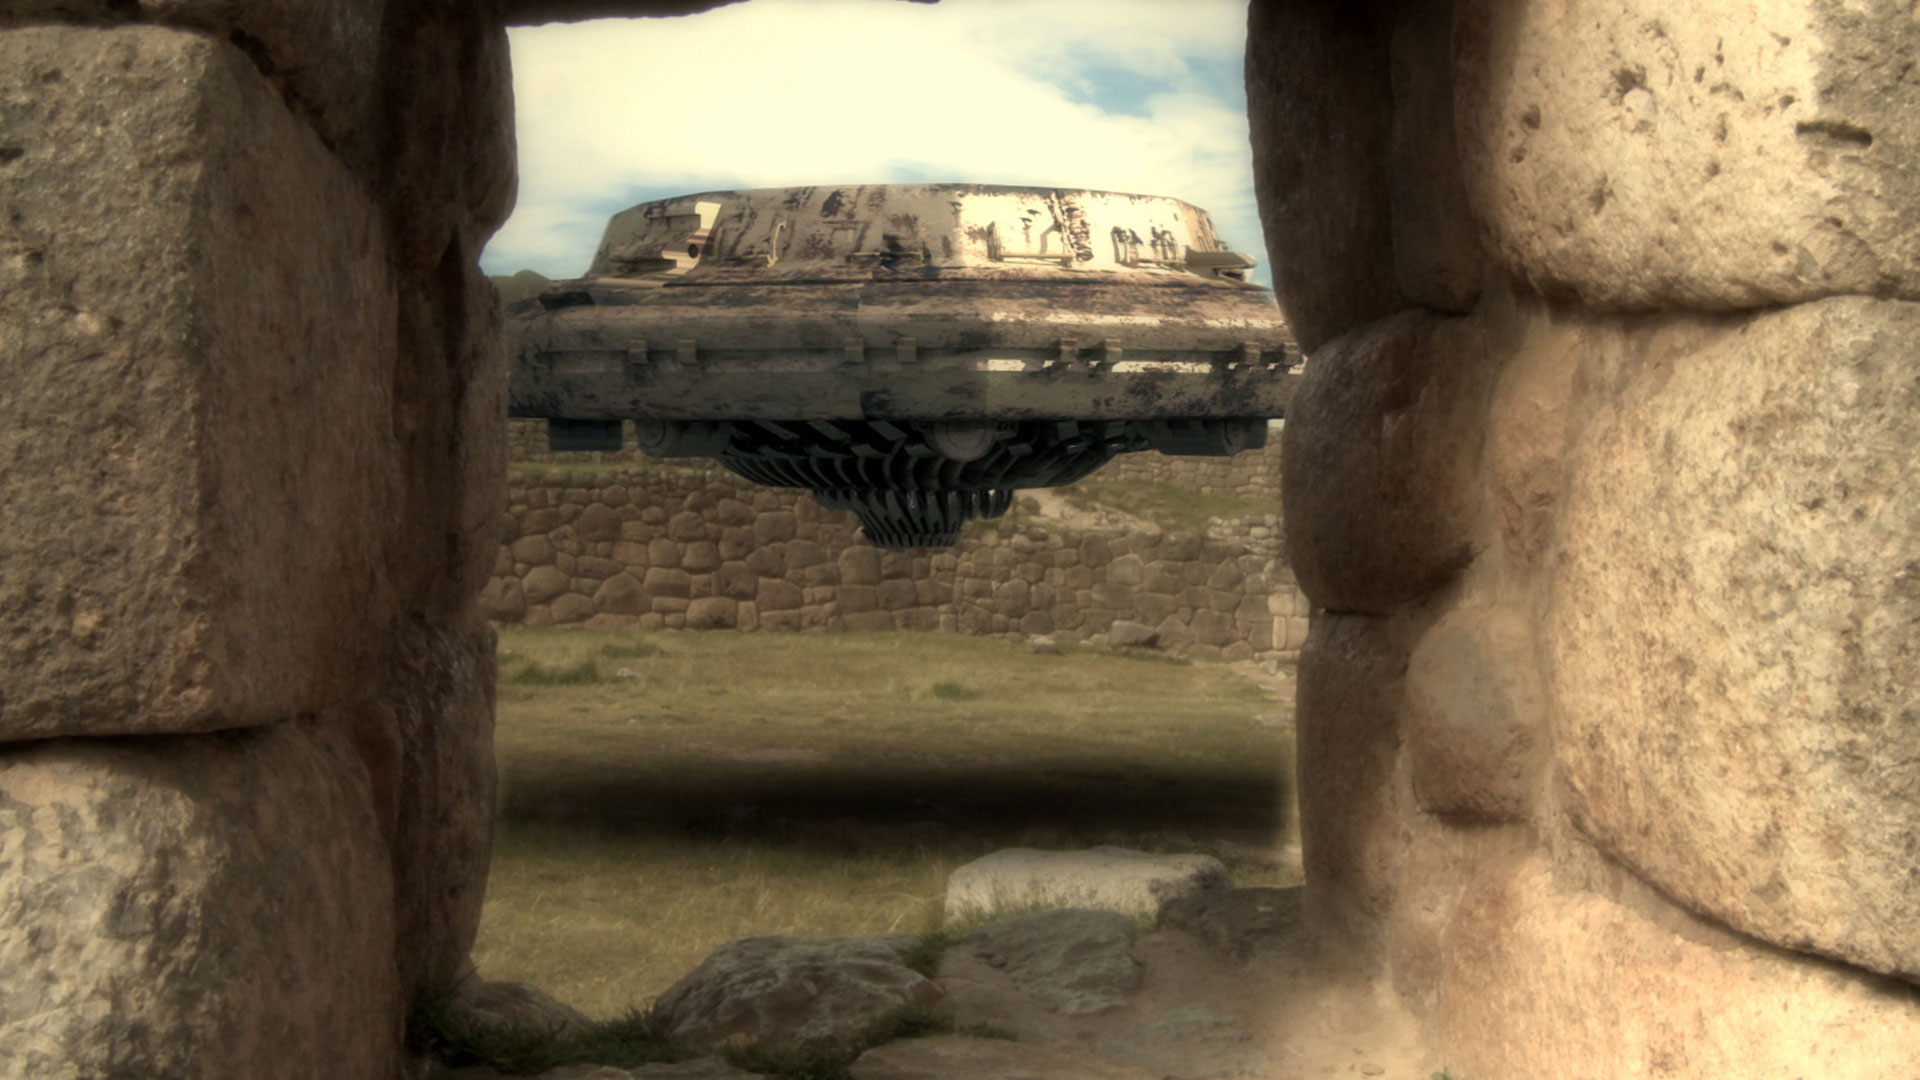 Ancient Aliens : The Alien Architects